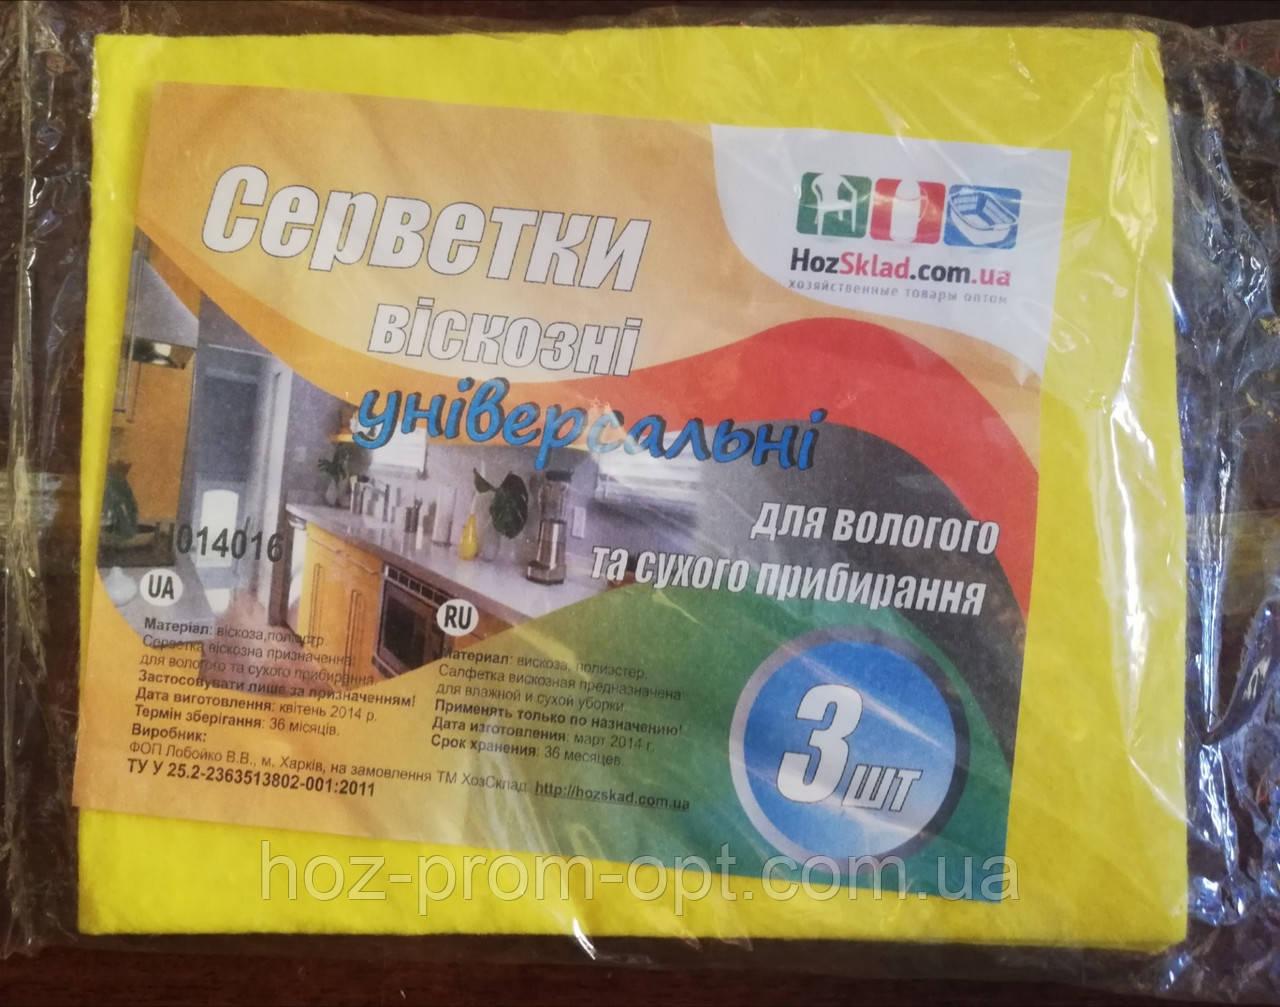 Салфетка вискозная - УНИВЕРСАЛЬНАЯ 250 х 360 мм 3 шт/уп.